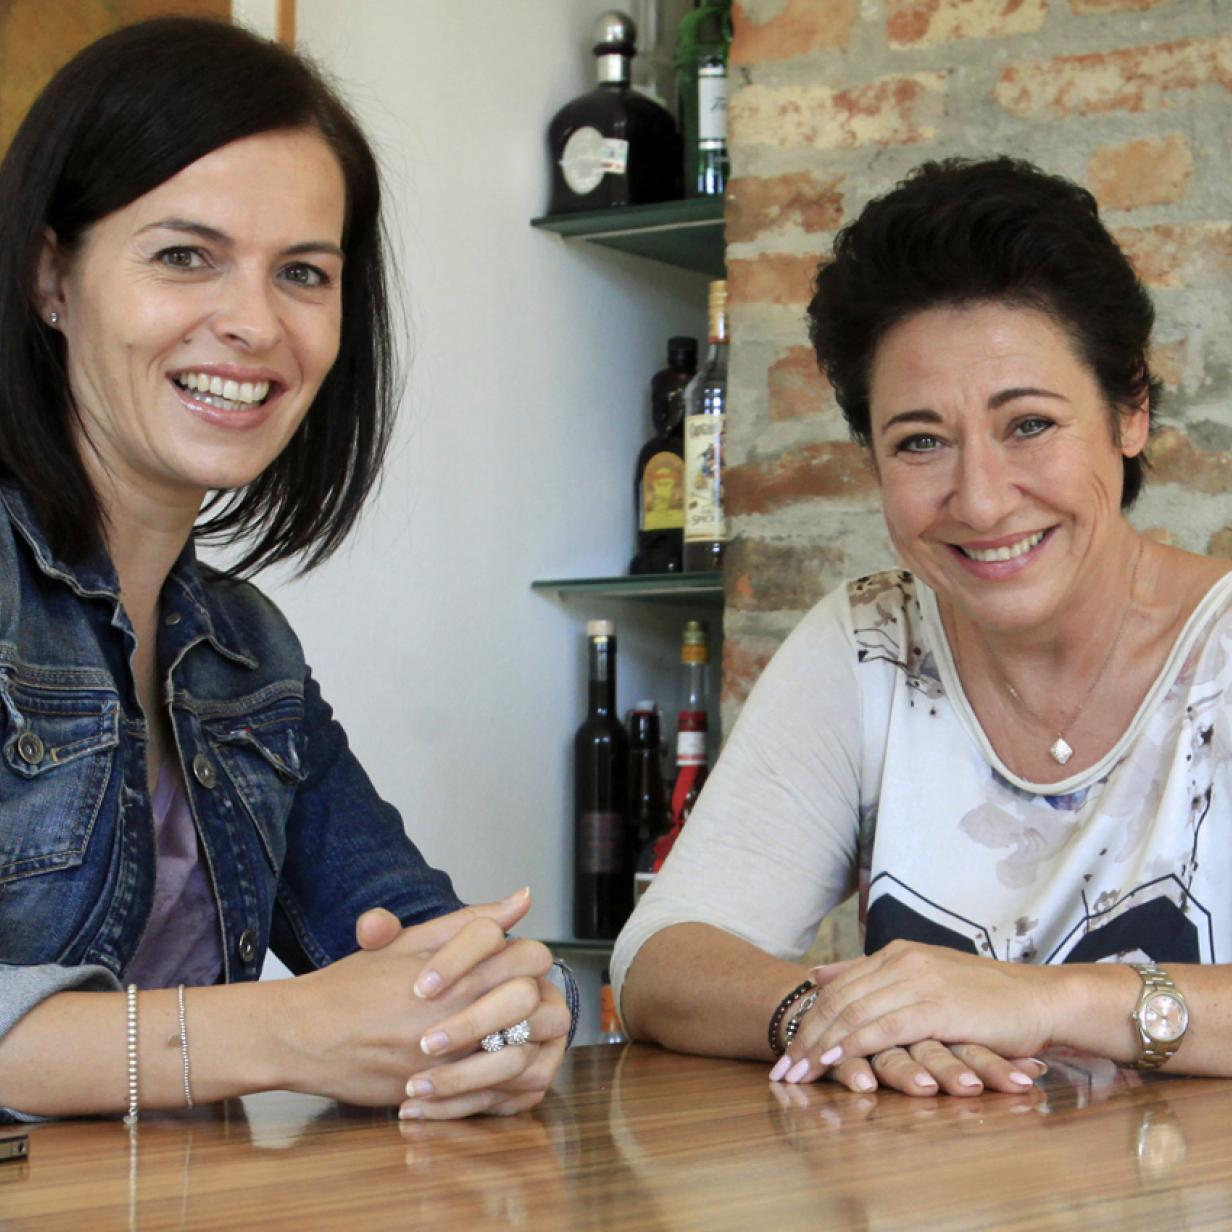 Singlebörse Steiermark Partnersuche Frauen